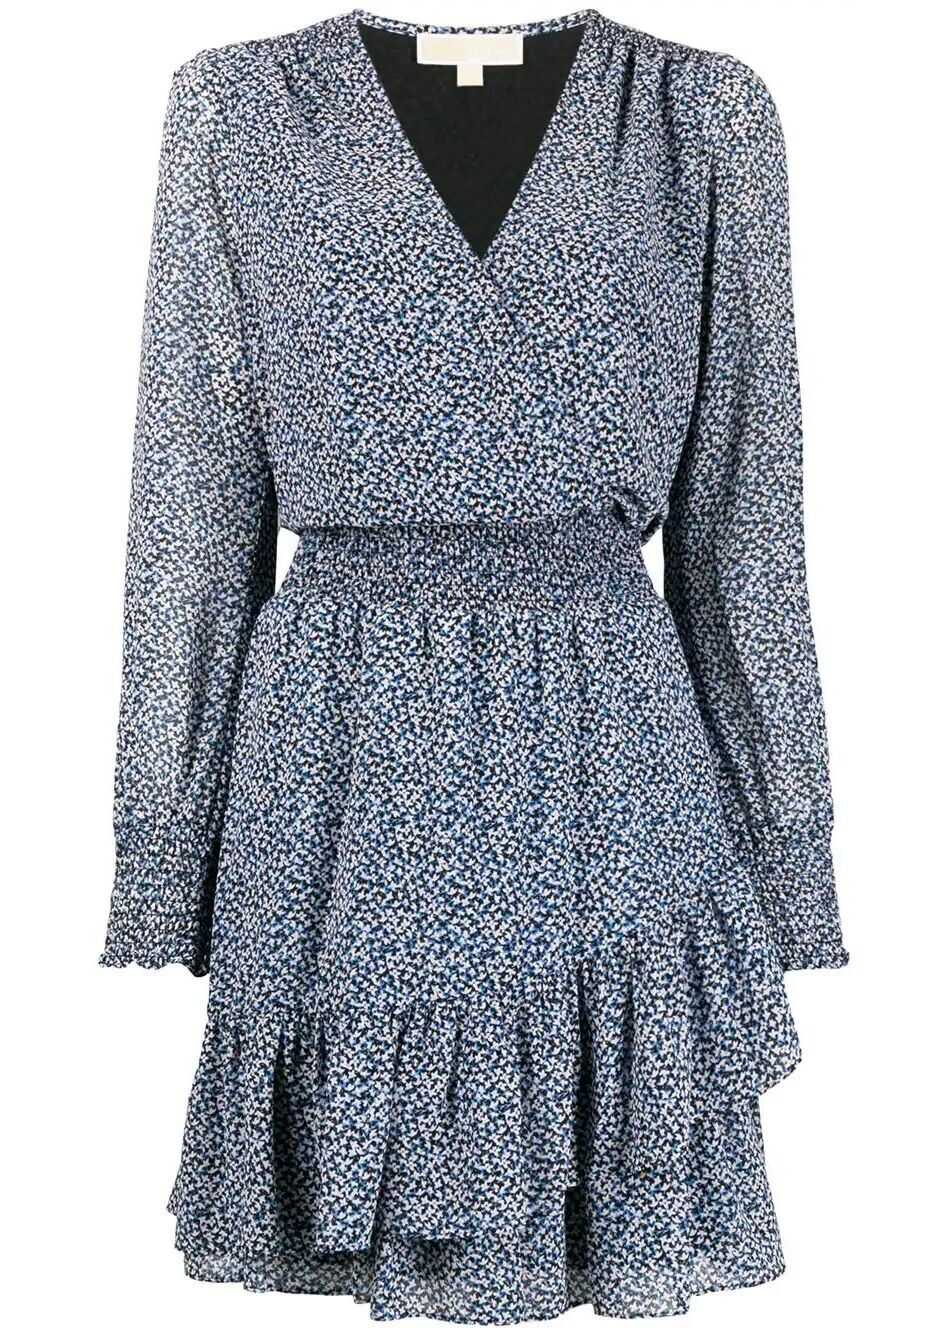 Michael Kors Synthetic Fibers Dress BLUE